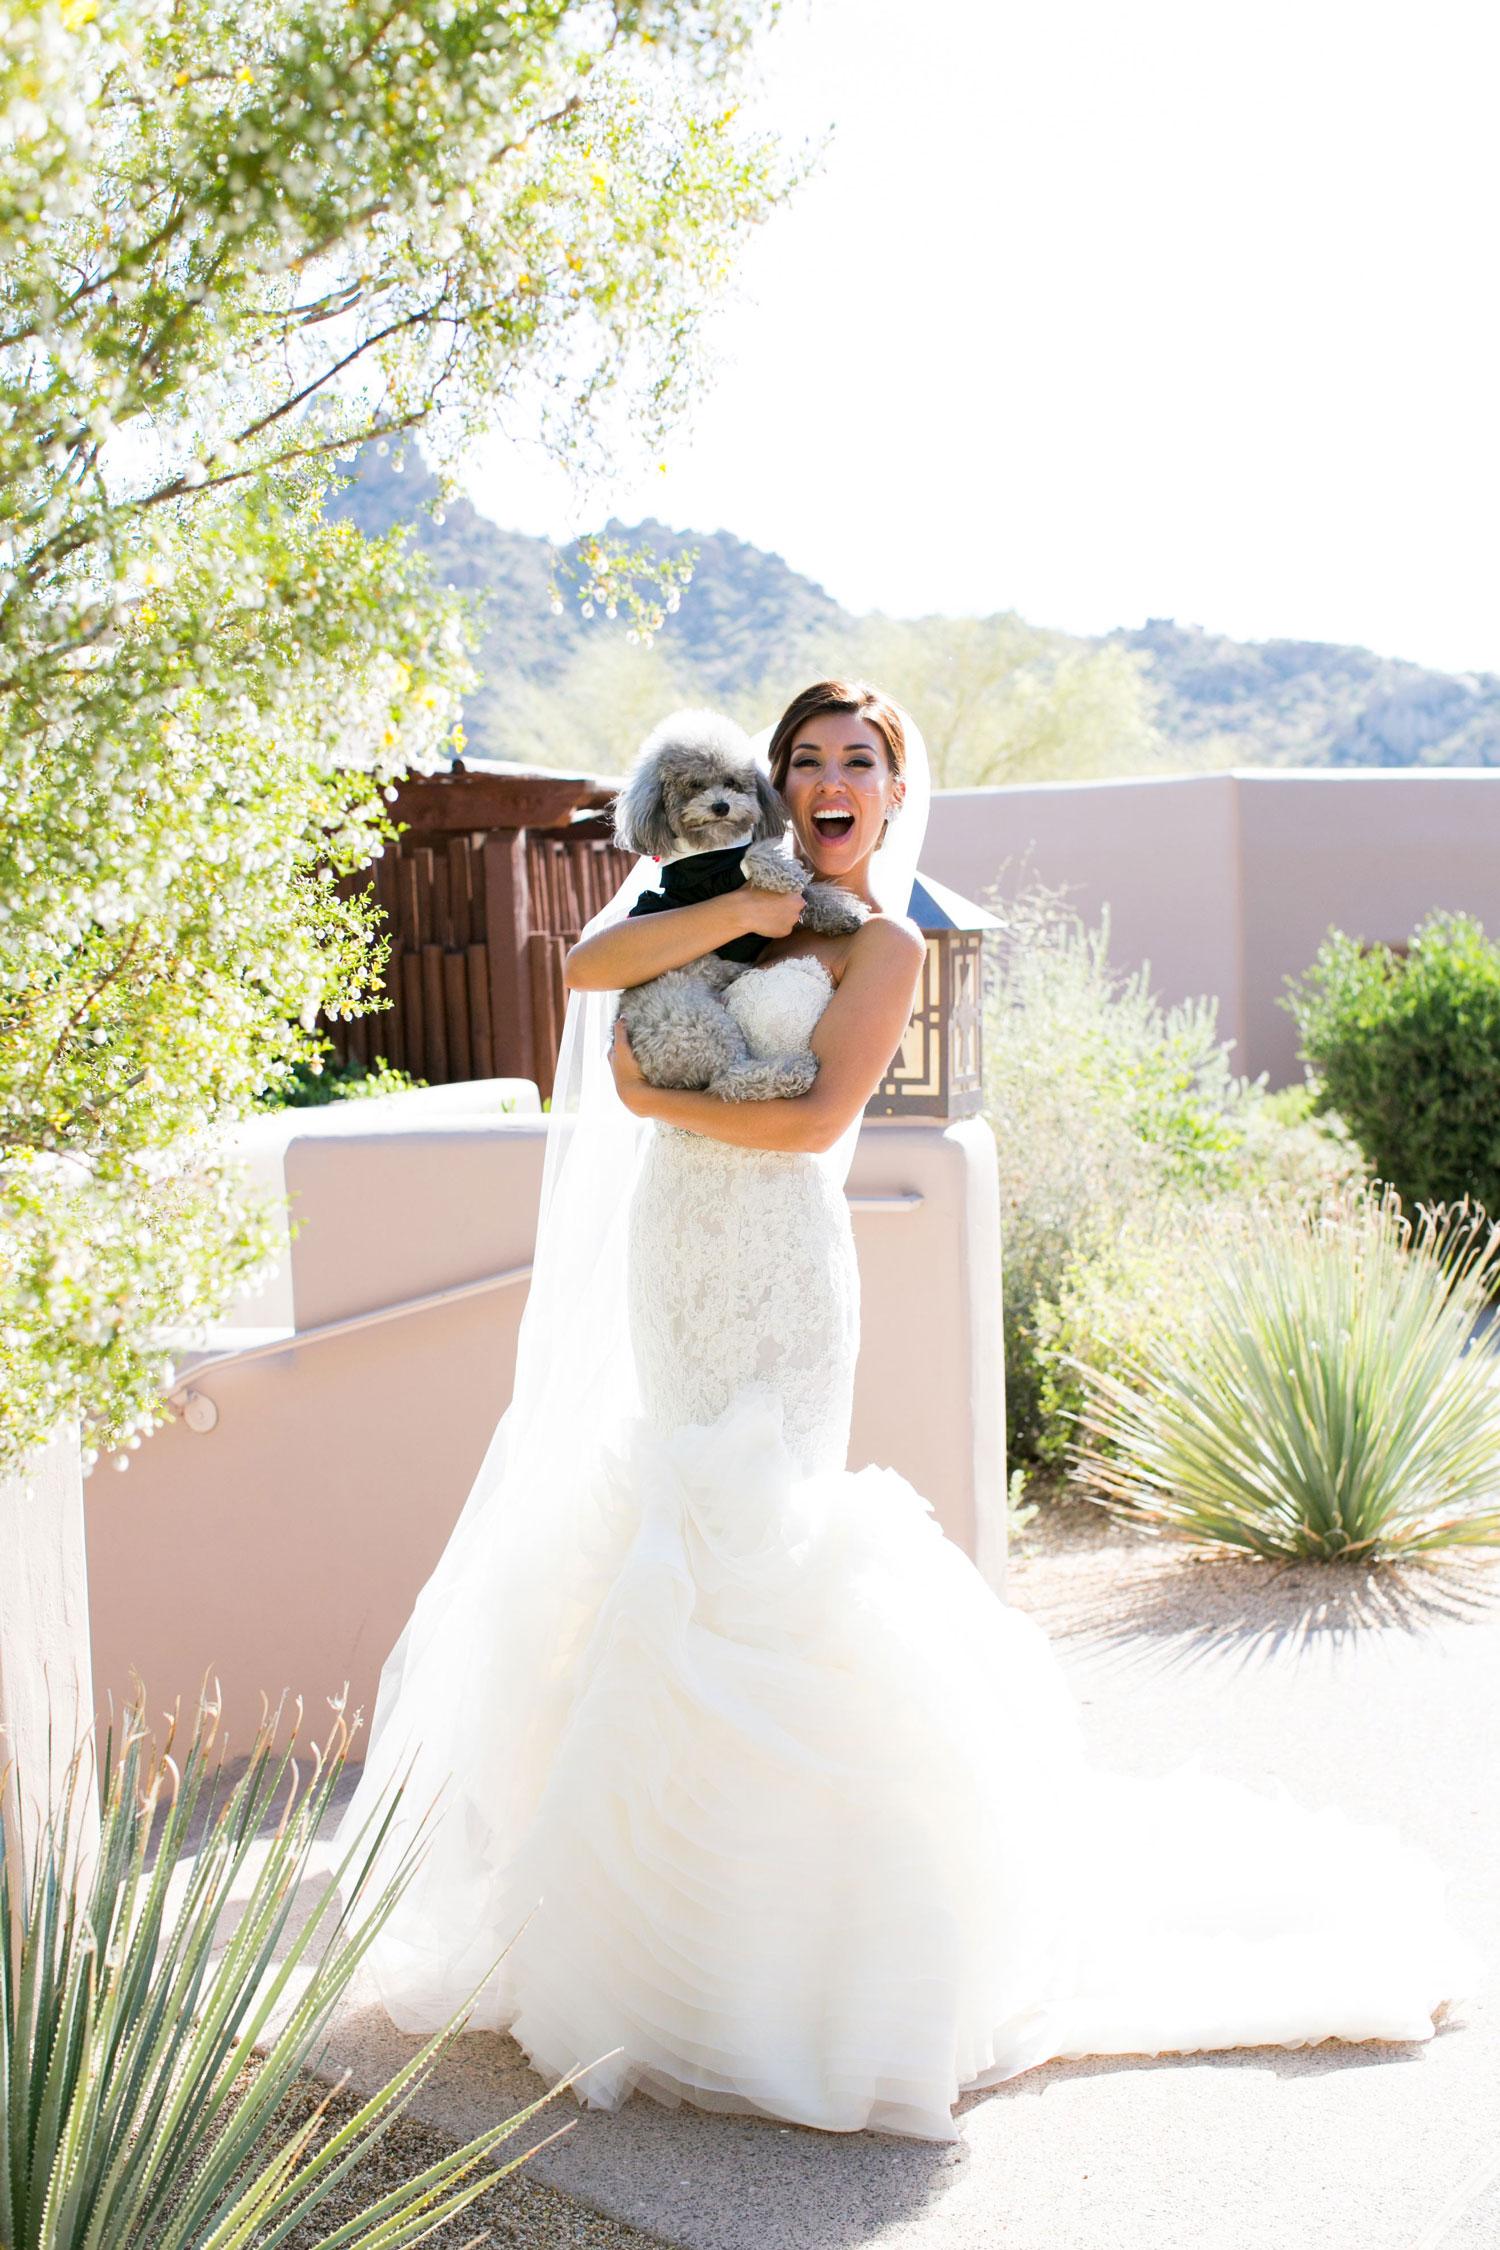 Adrianna Costa TV host holding grey little dog at wedding